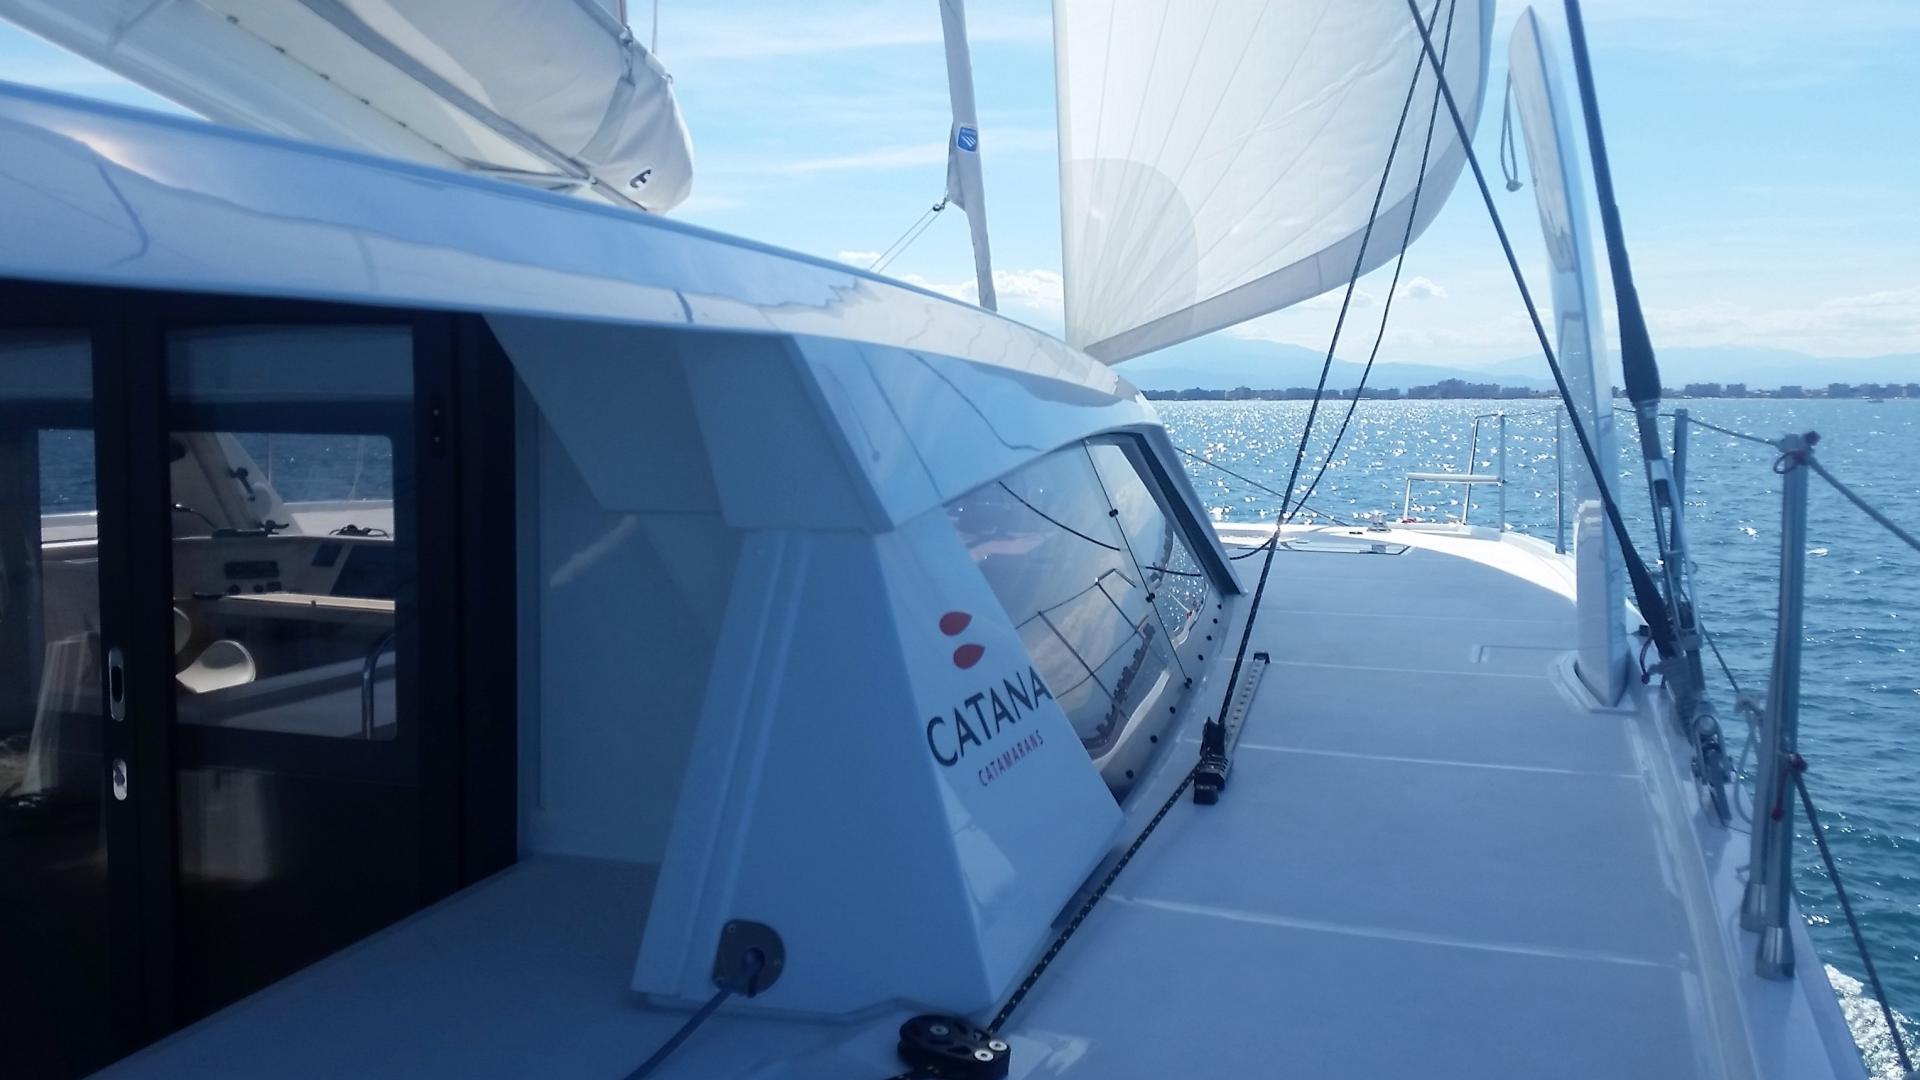 Catana 53 under sails